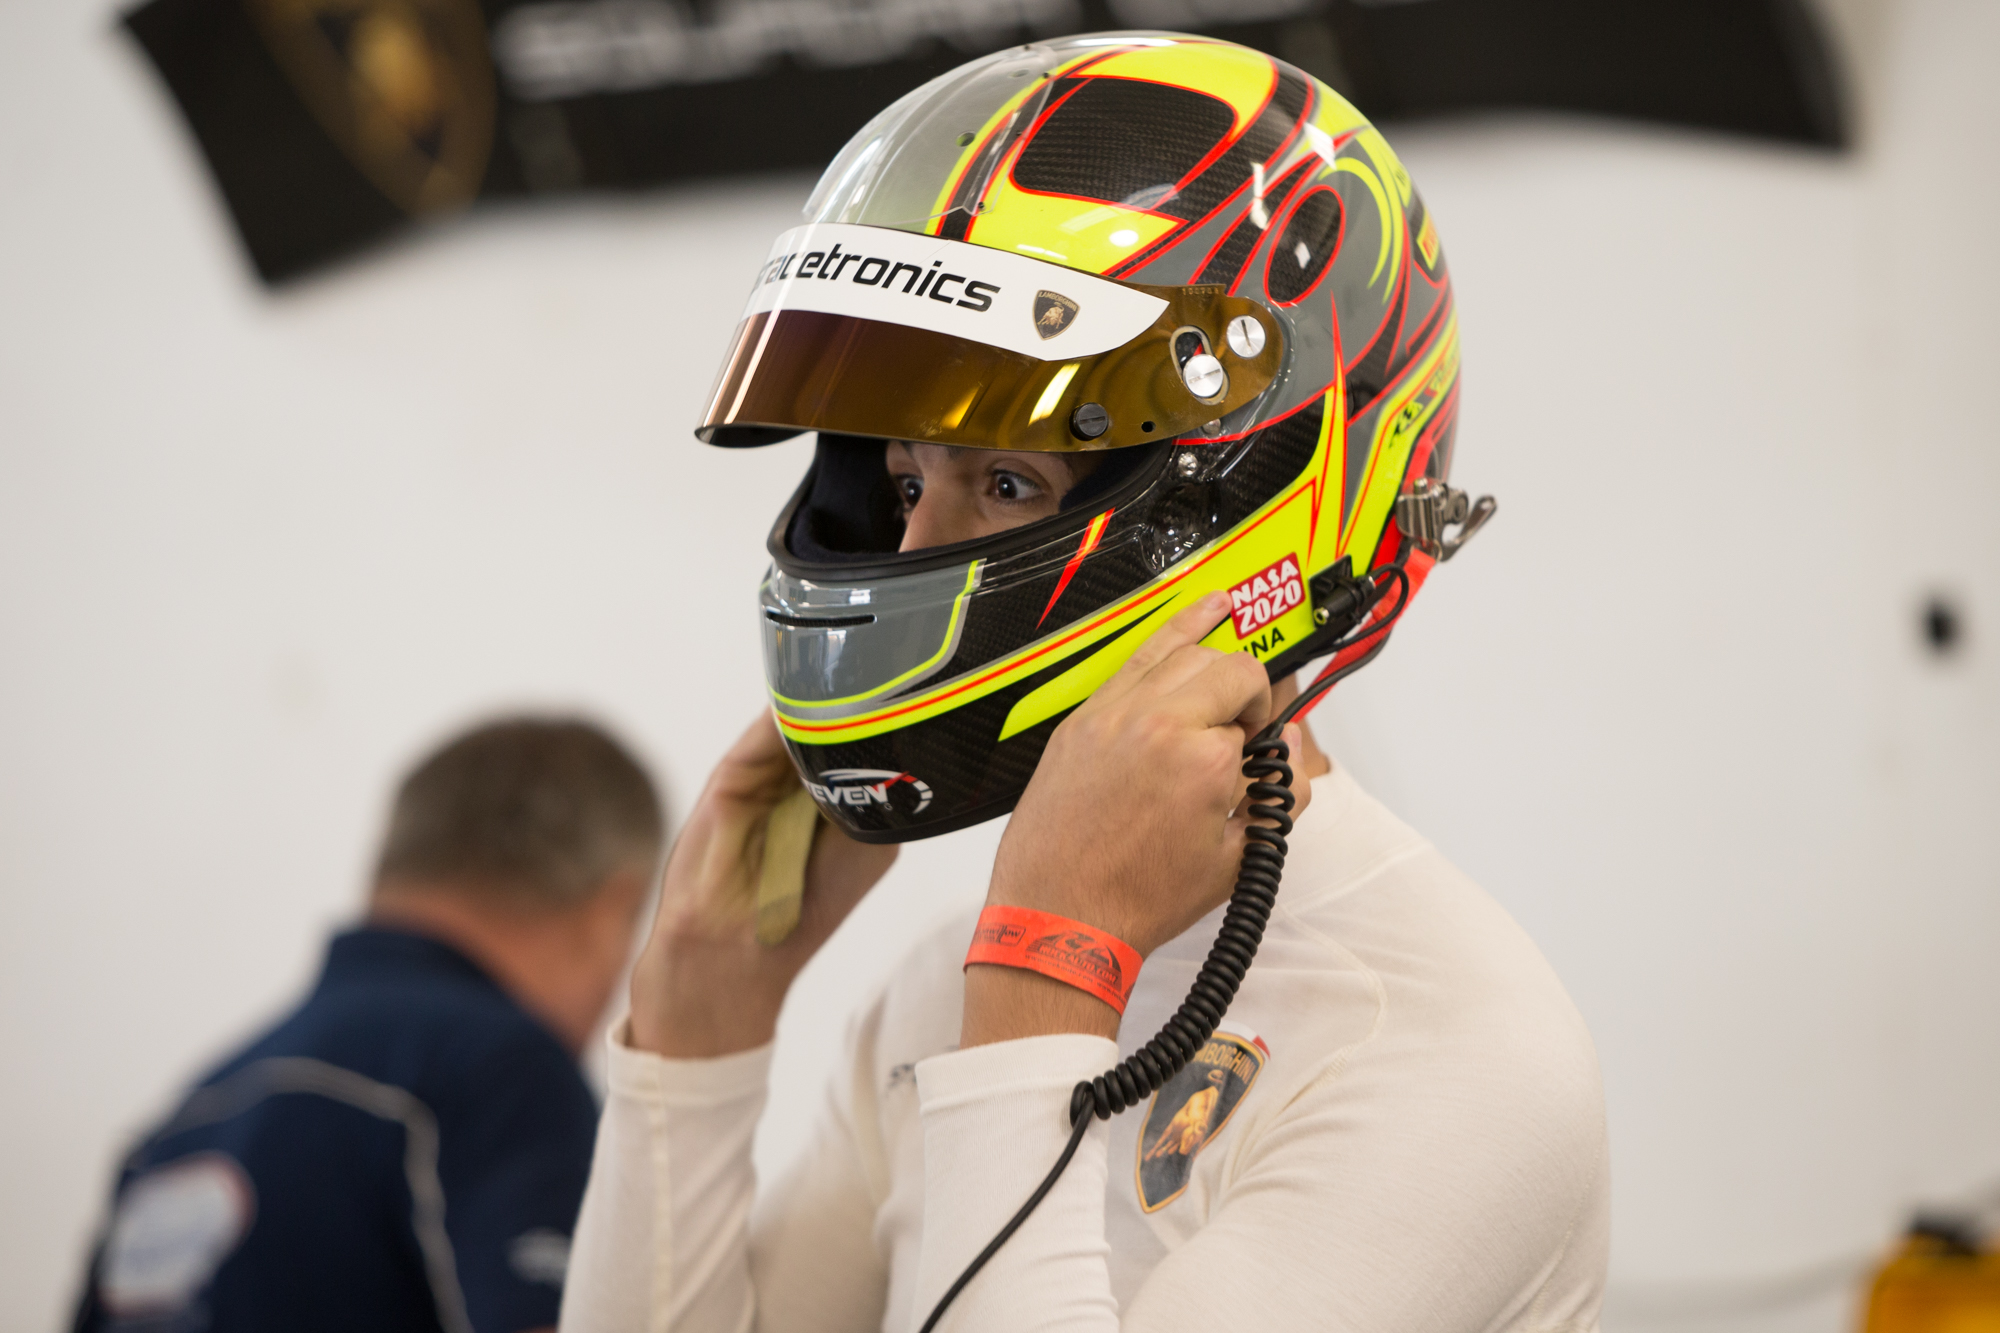 Steven-Racing-20171027-53367.jpg